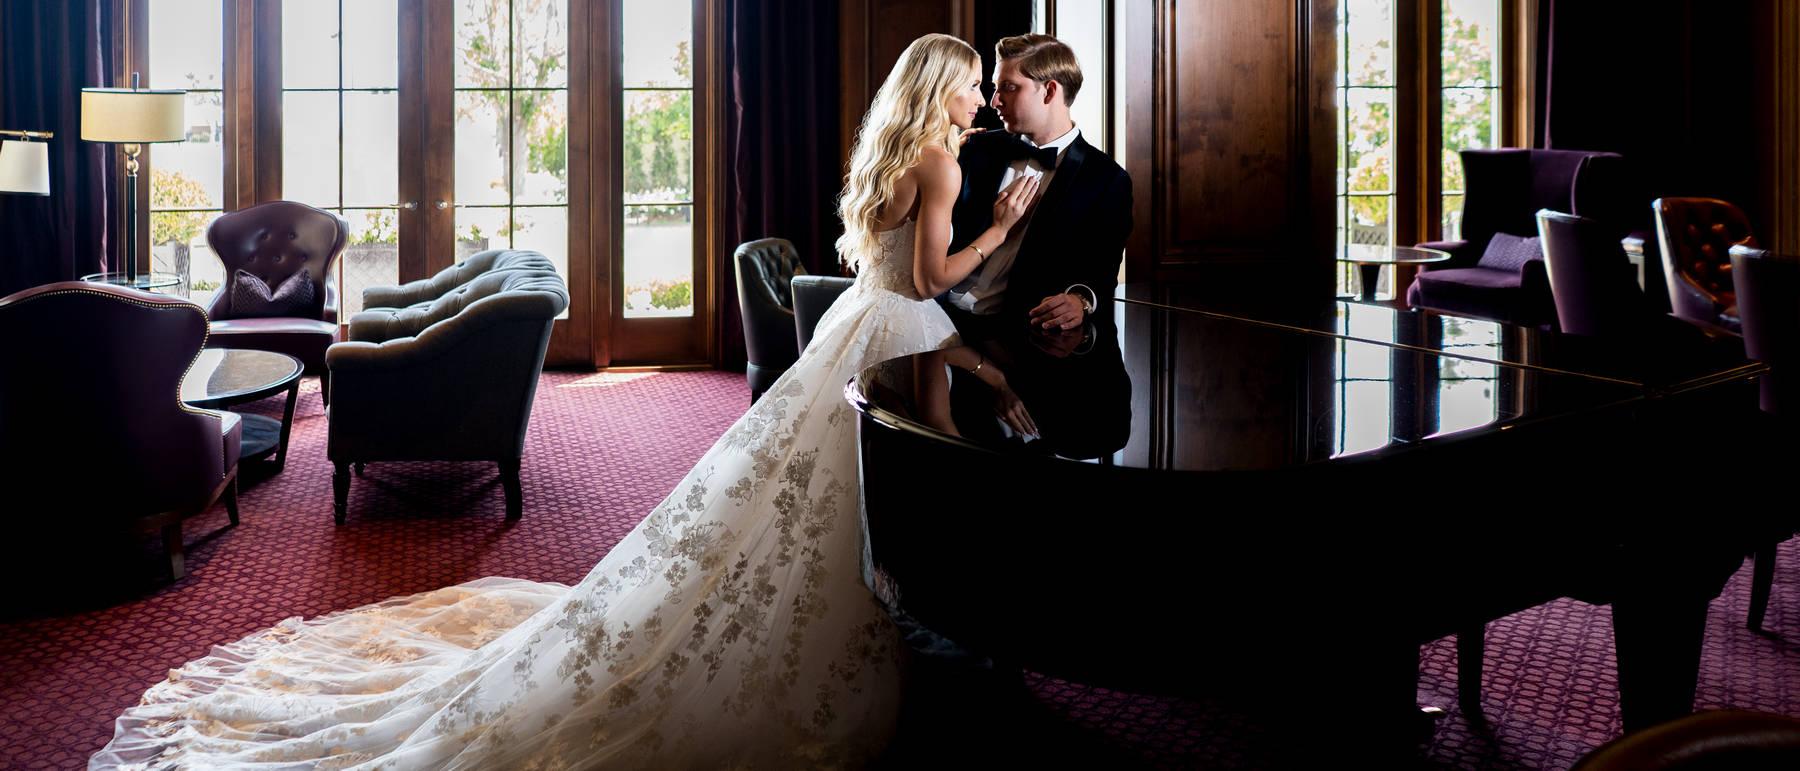 johnandjoseph-wedding-photographer-hz-slider-254